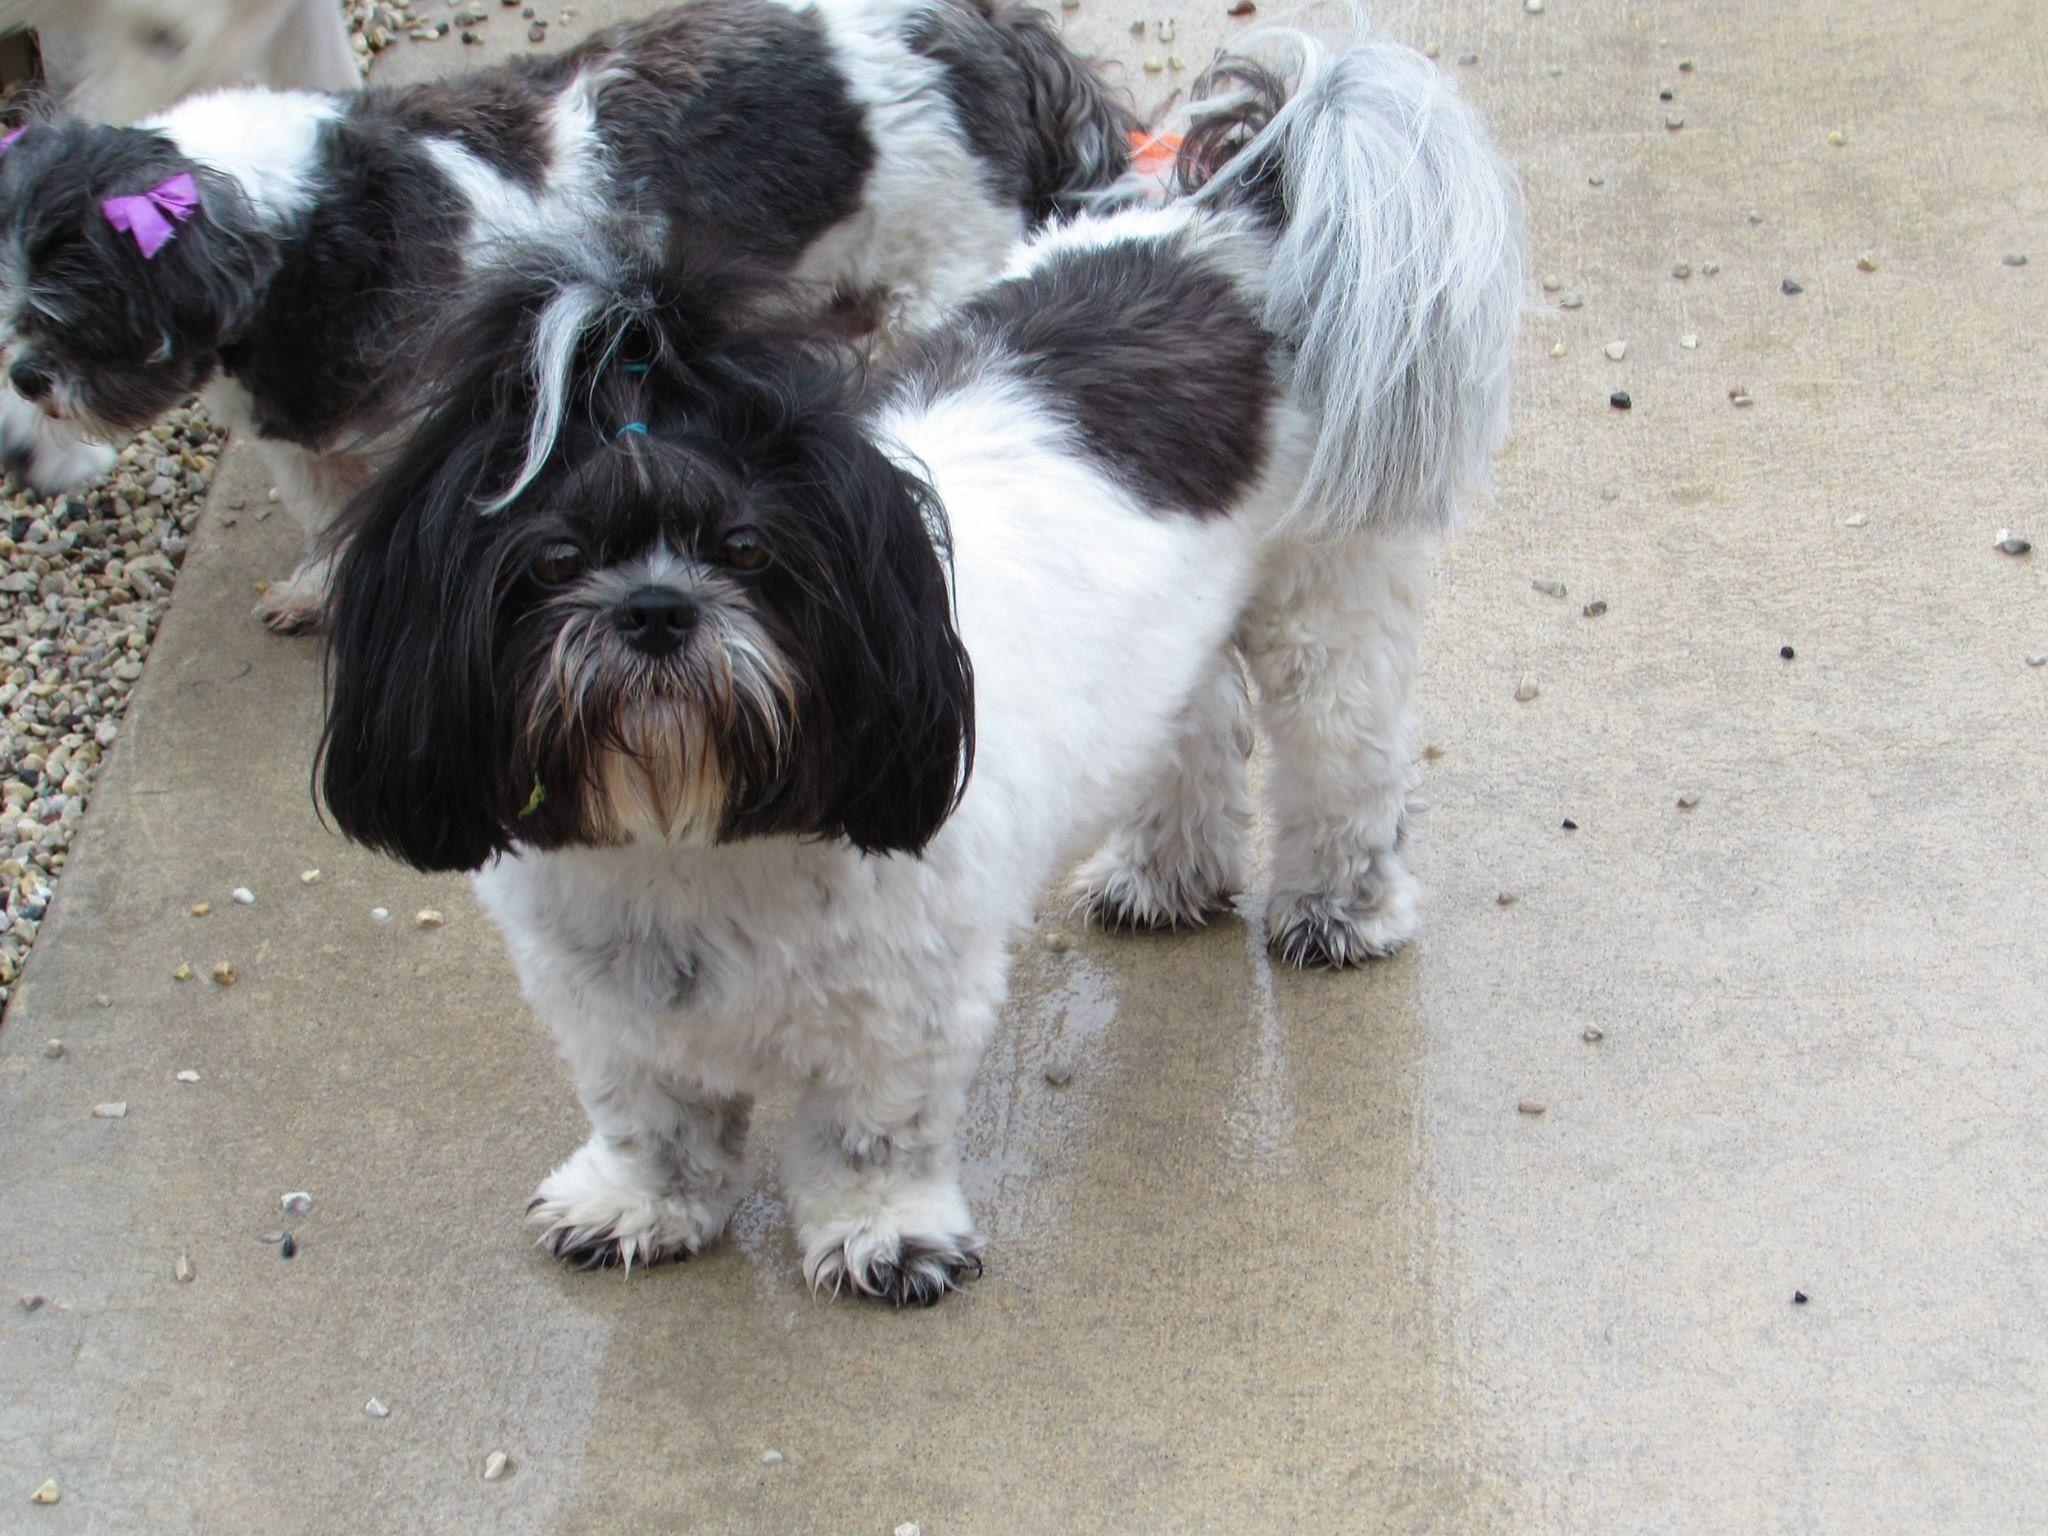 Pin By Gail Zeininger Boushley On Shih Tzus Shih Tzus Cute Dog